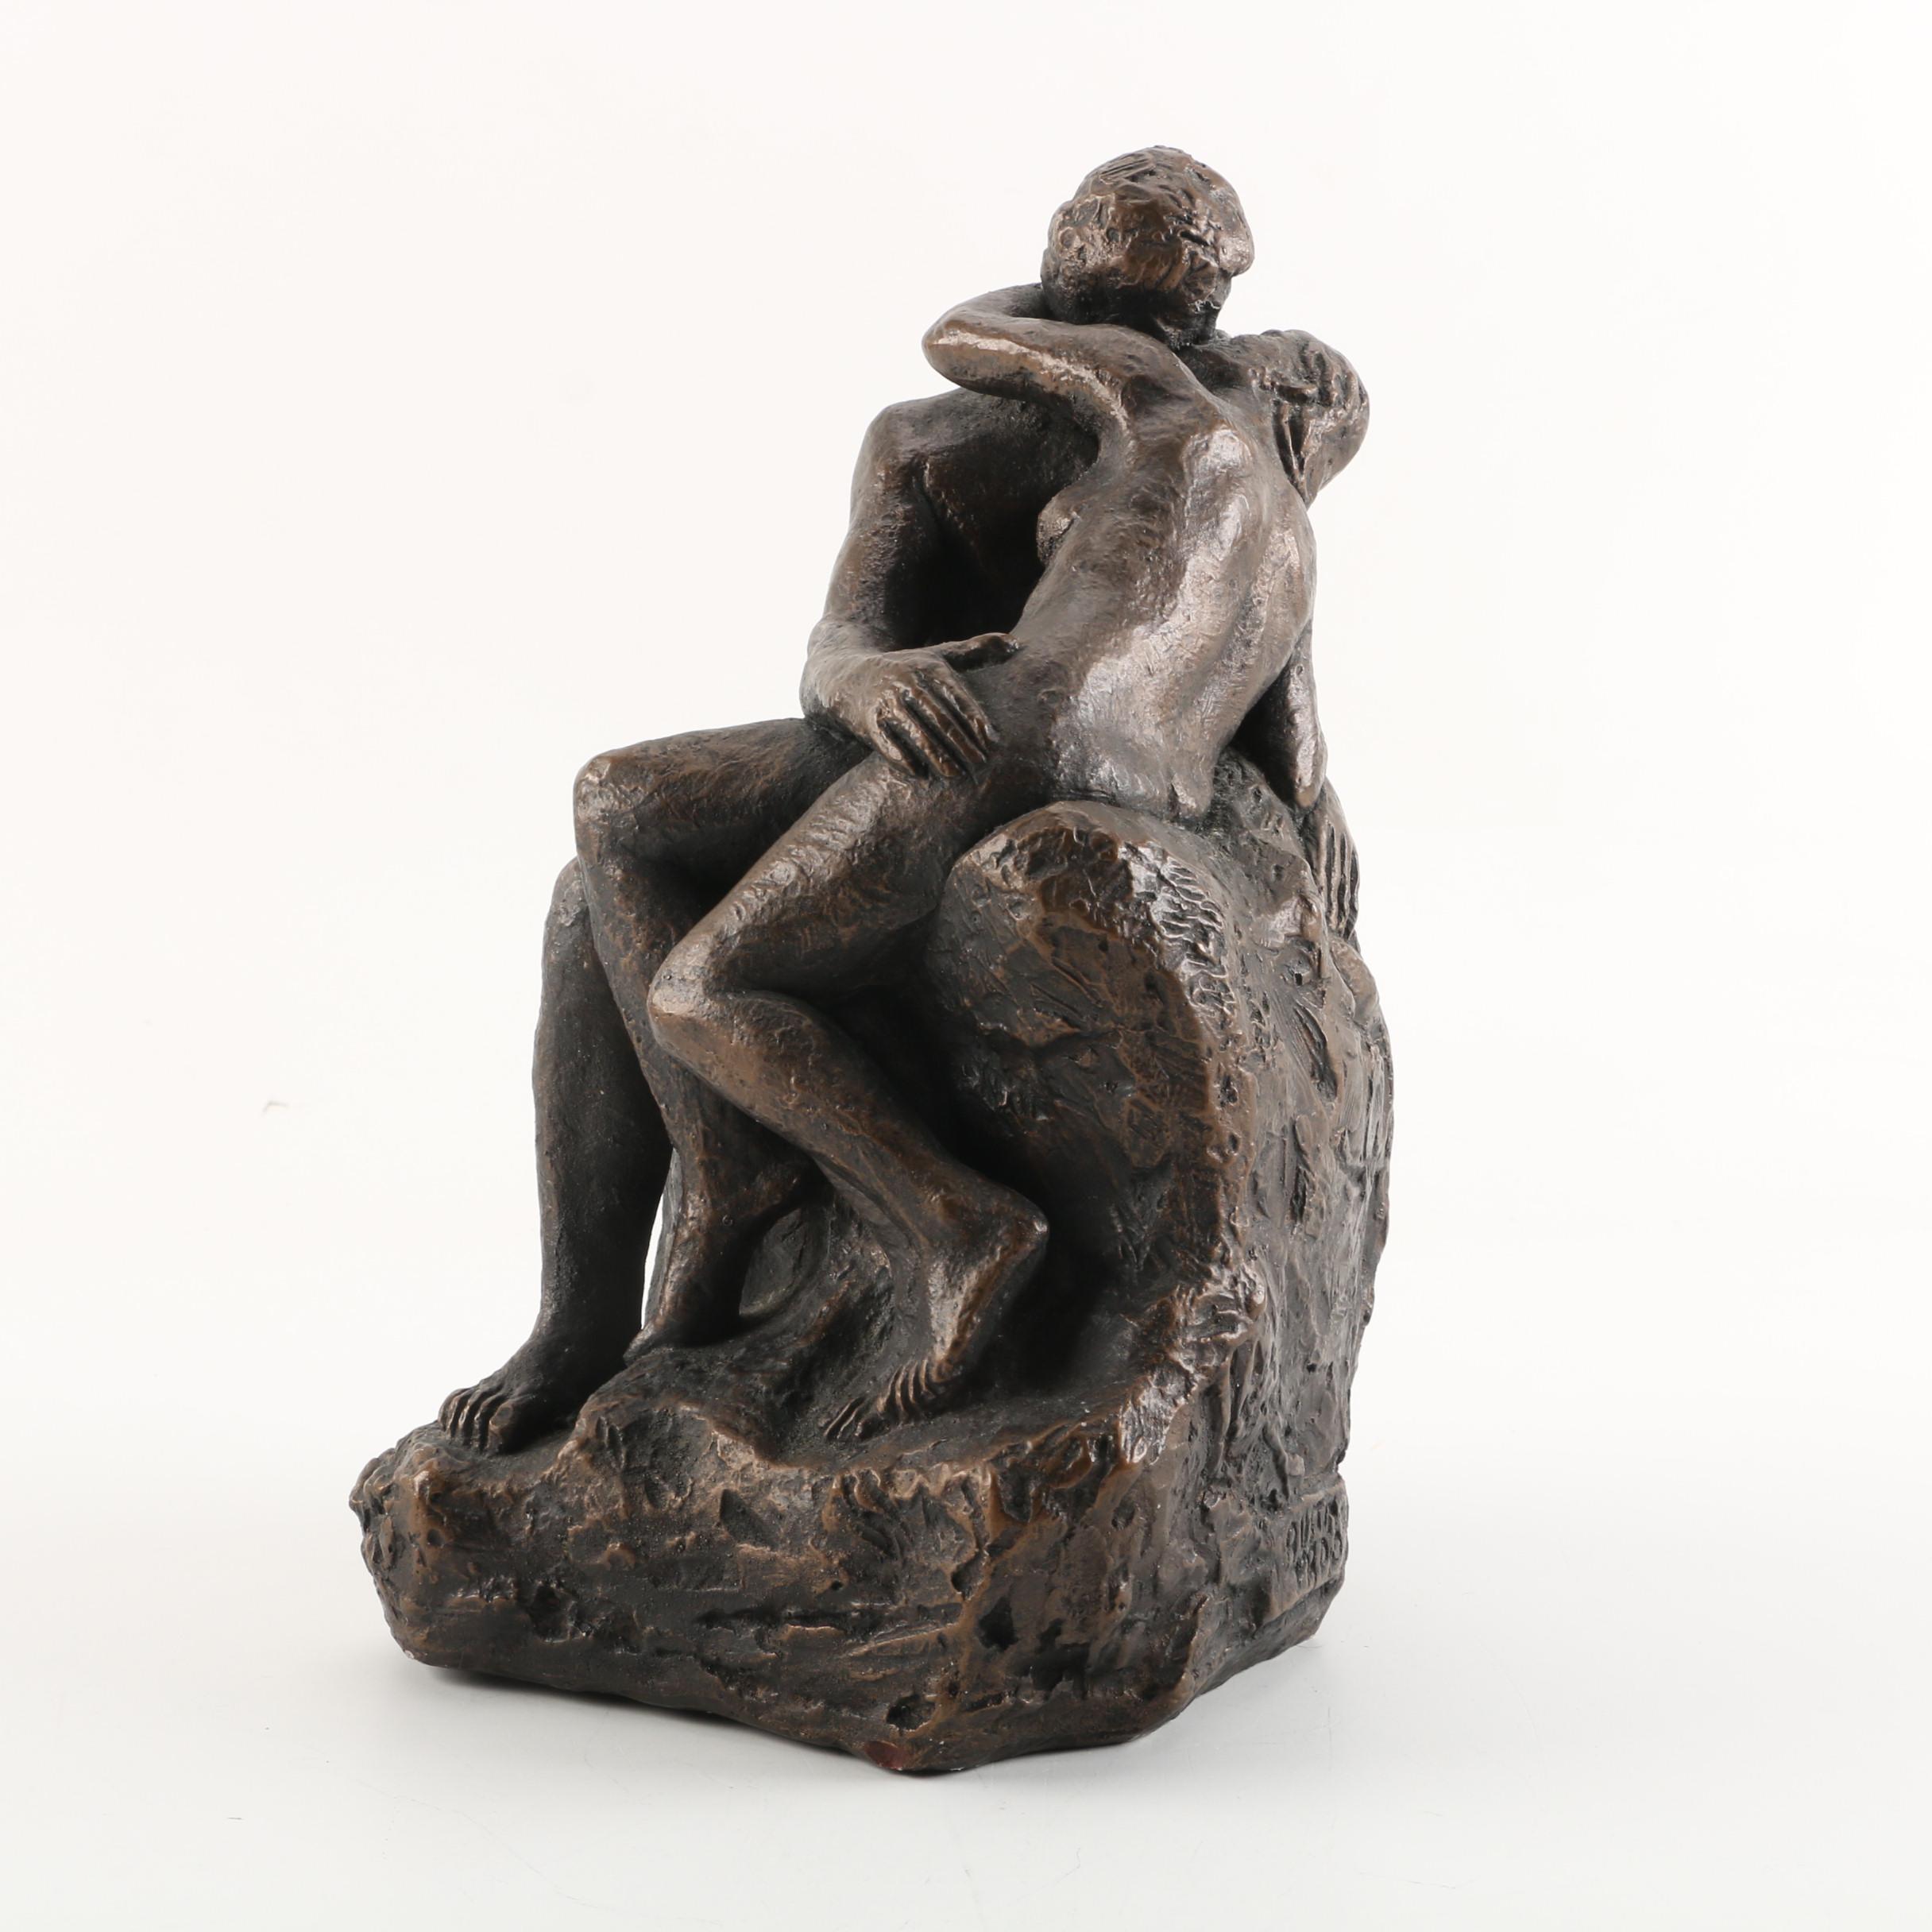 "Austin Productions Composite Sculpture After Rodin ""The Kiss"""